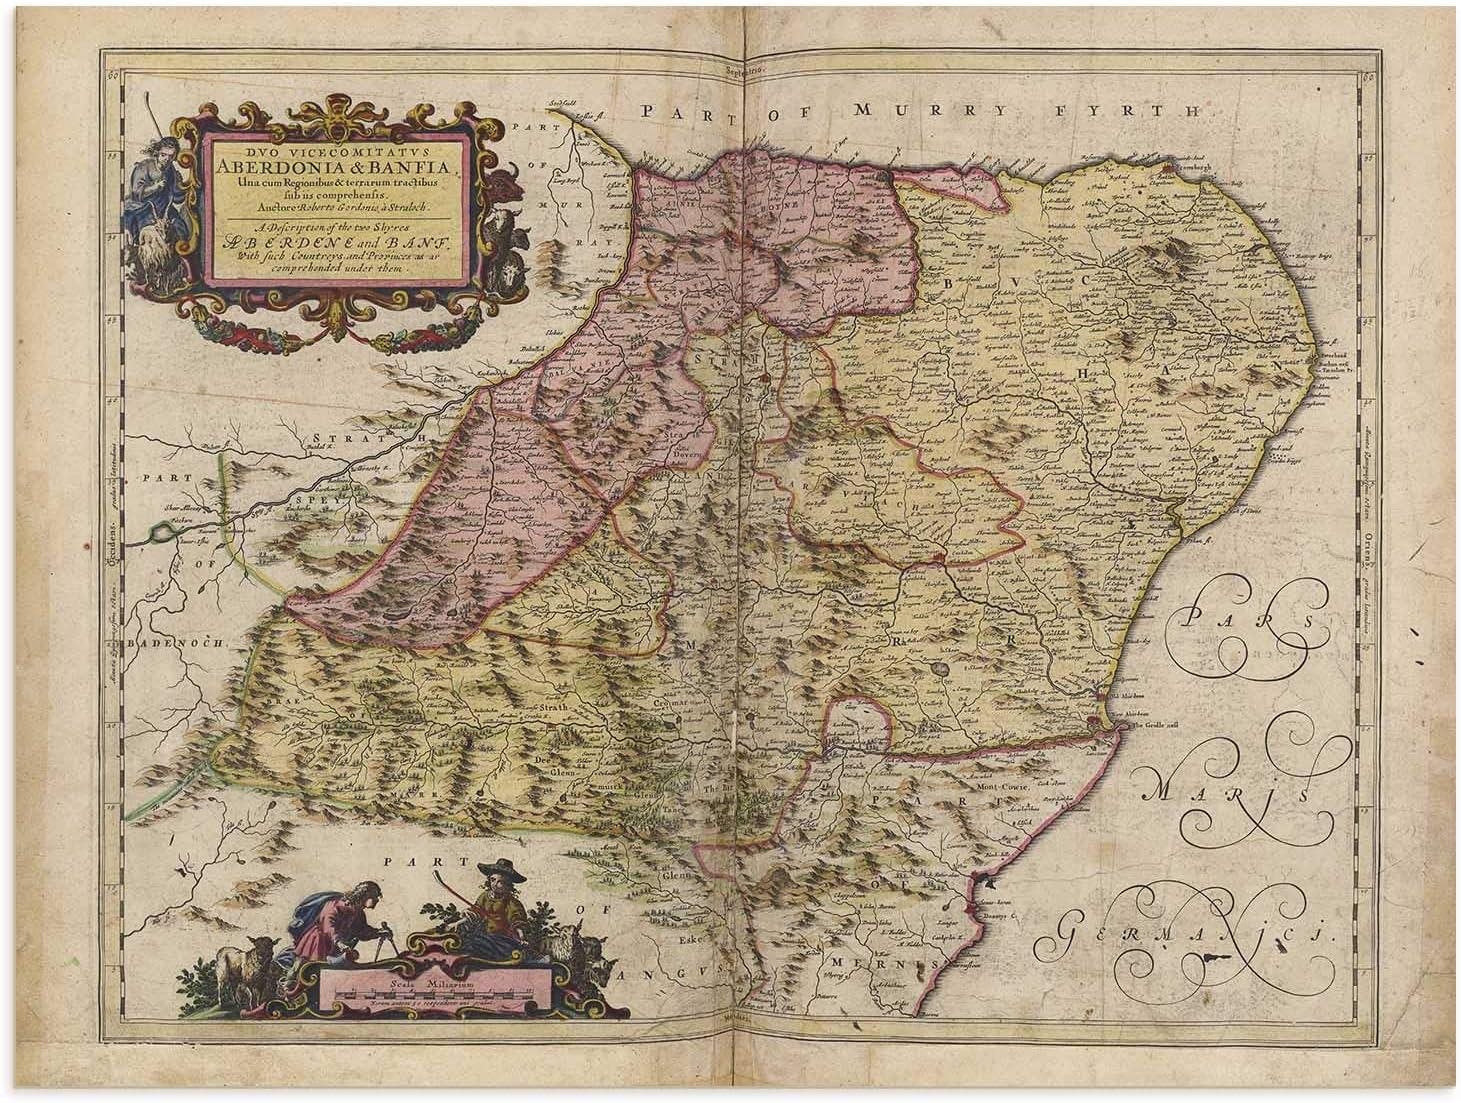 The Blaeu Prints   Aberdeenshire, Scotland - Historical Map Print from Antique Atlas by Joan Blaeu - Old Map Shows: Aberdeen, Elgin, Peterhead